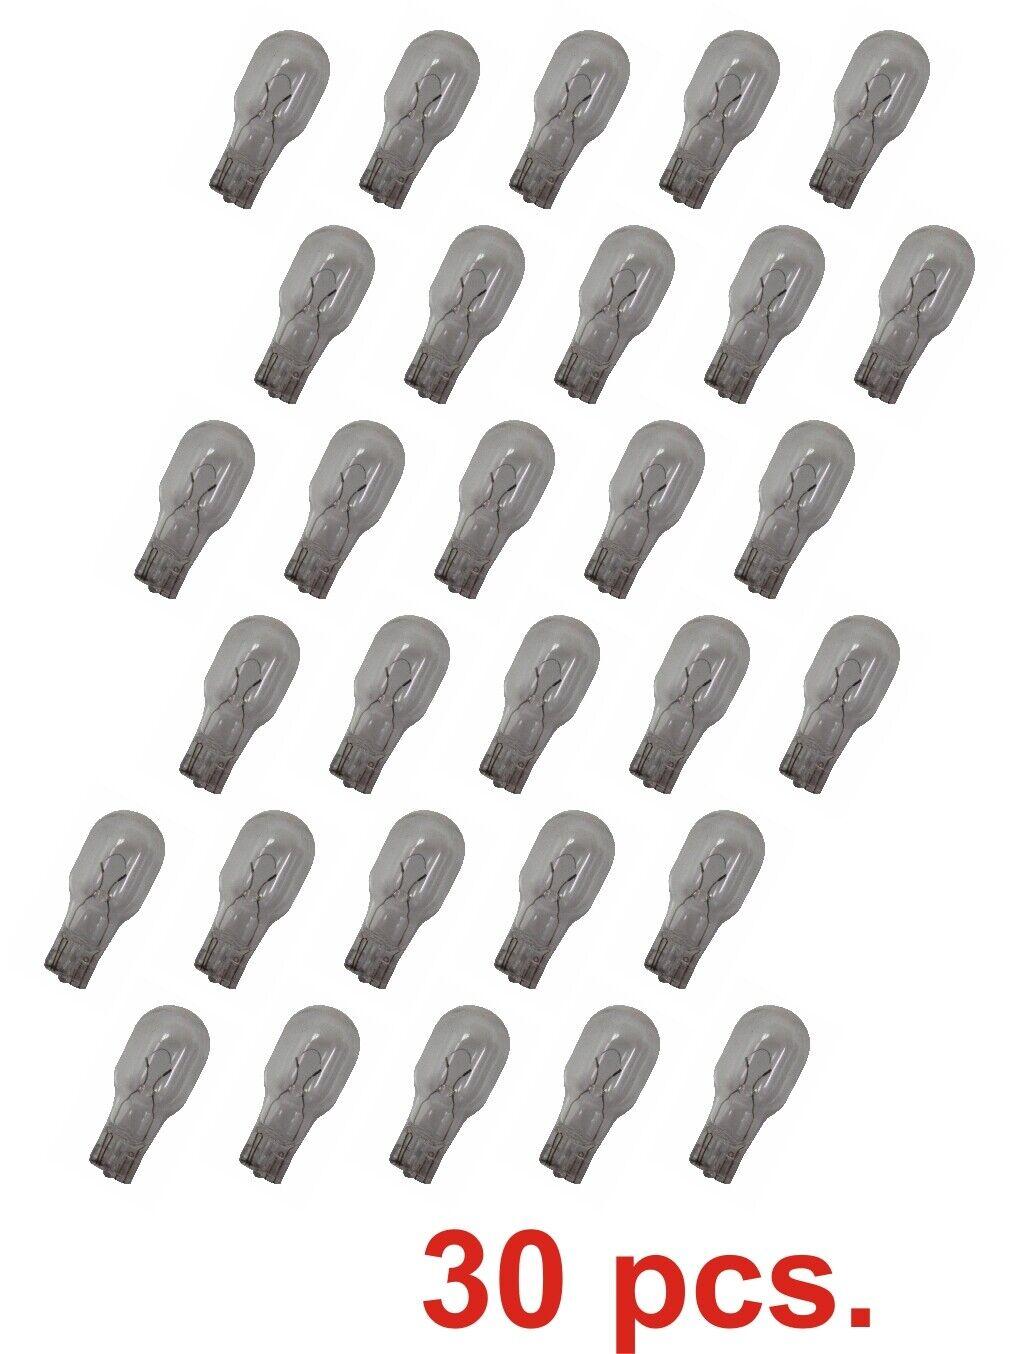 30 TORO 7 Watt Clear T-5 Wedge 12 V Replacement Bulbs for La